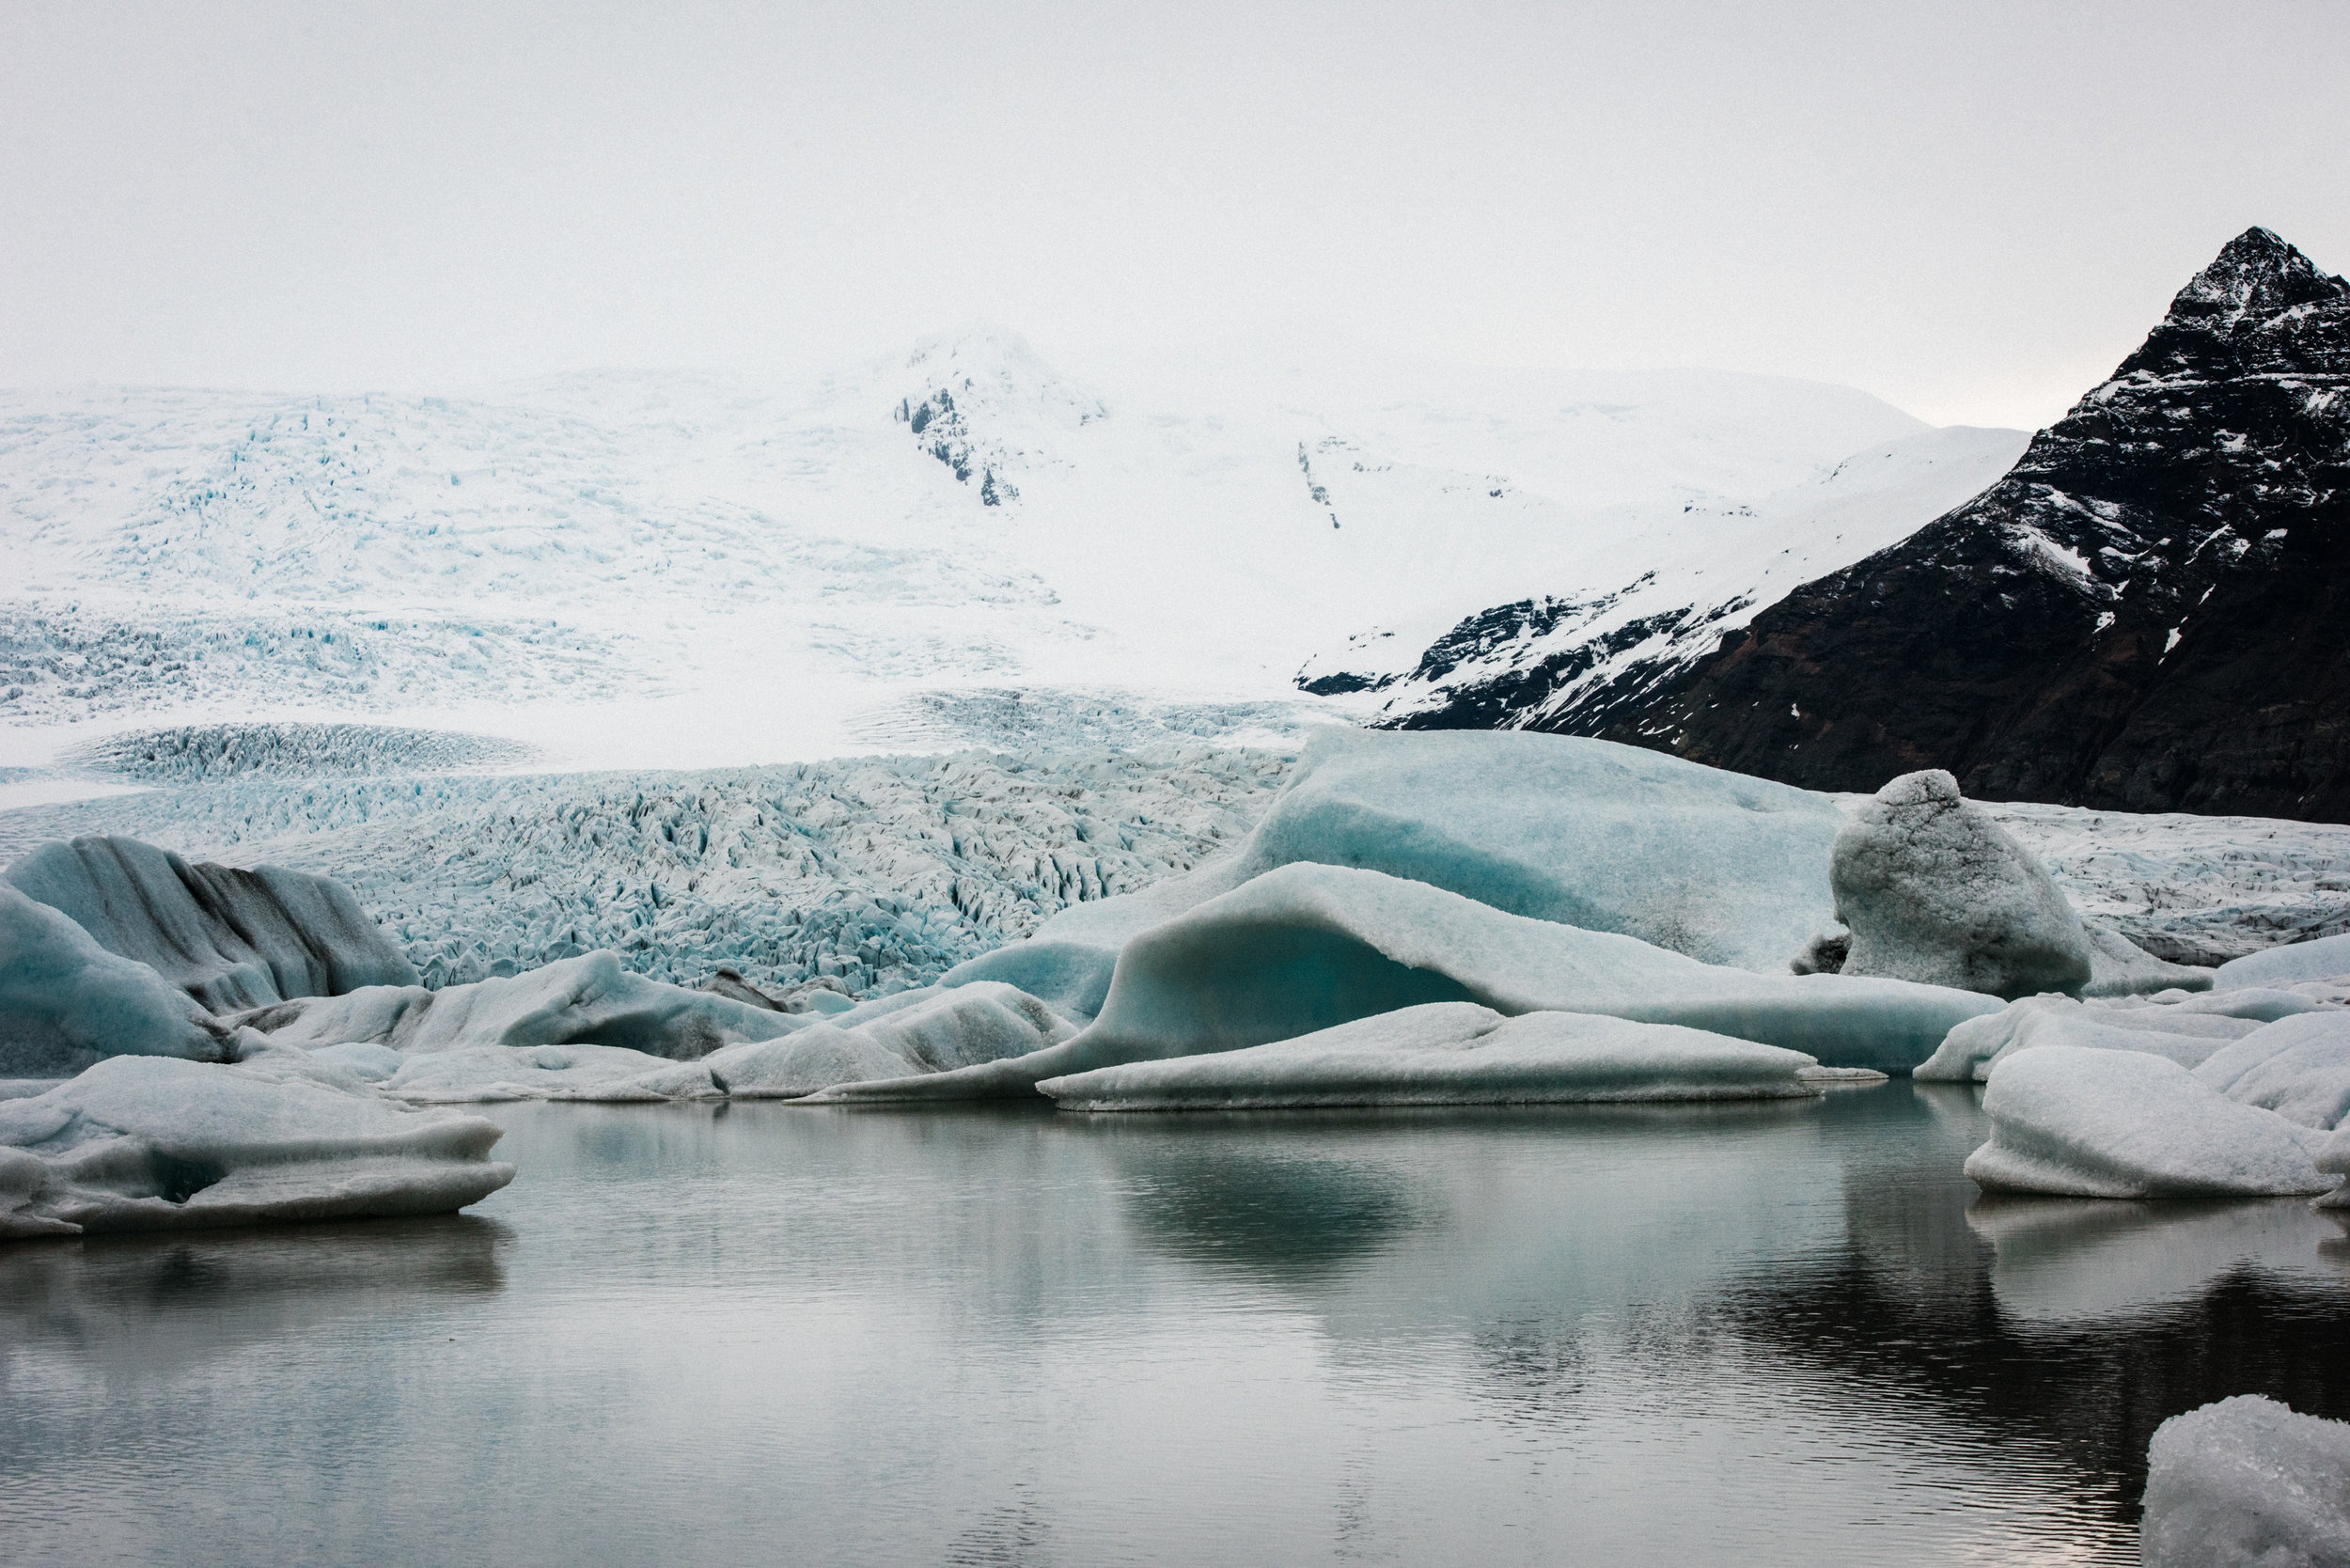 ICELAND_WOMAN_PHOTOGRAPHER_TARASHUPE_OUTDOOR_PHOTOGRAPHY_066.jpg